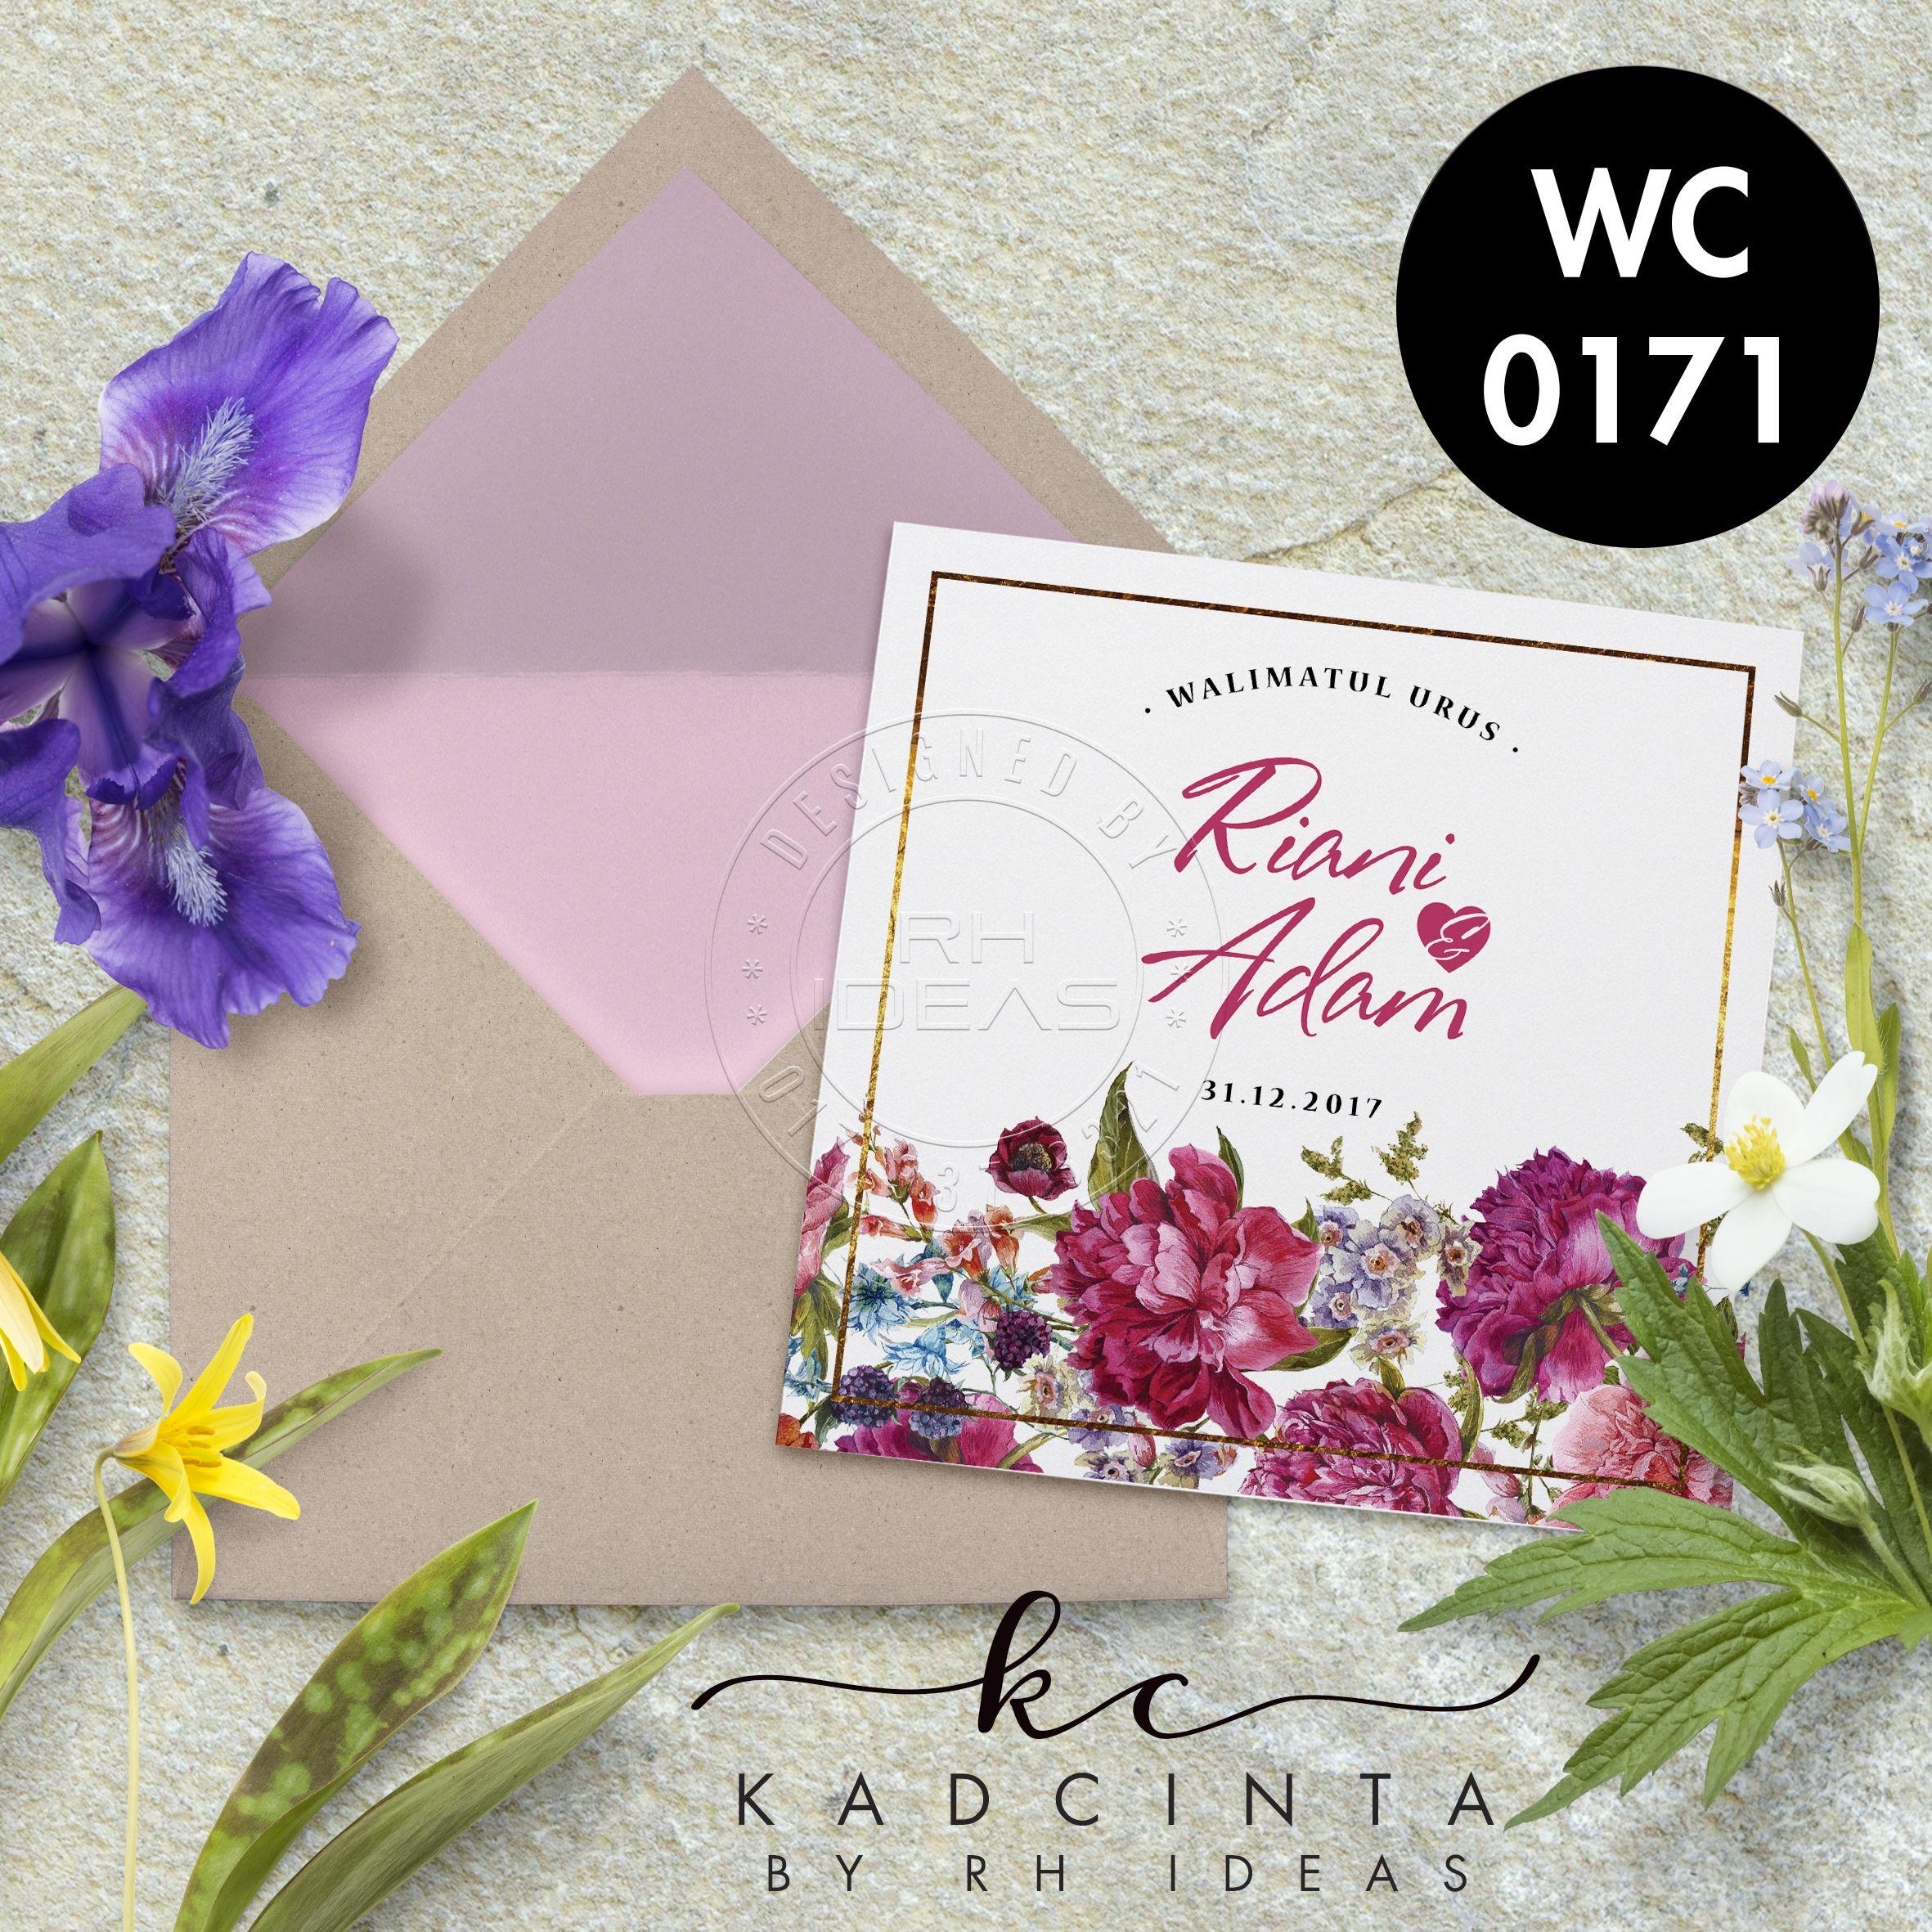 Kad Kahwin Wc0171 Kad Kahwin Wedding Cards